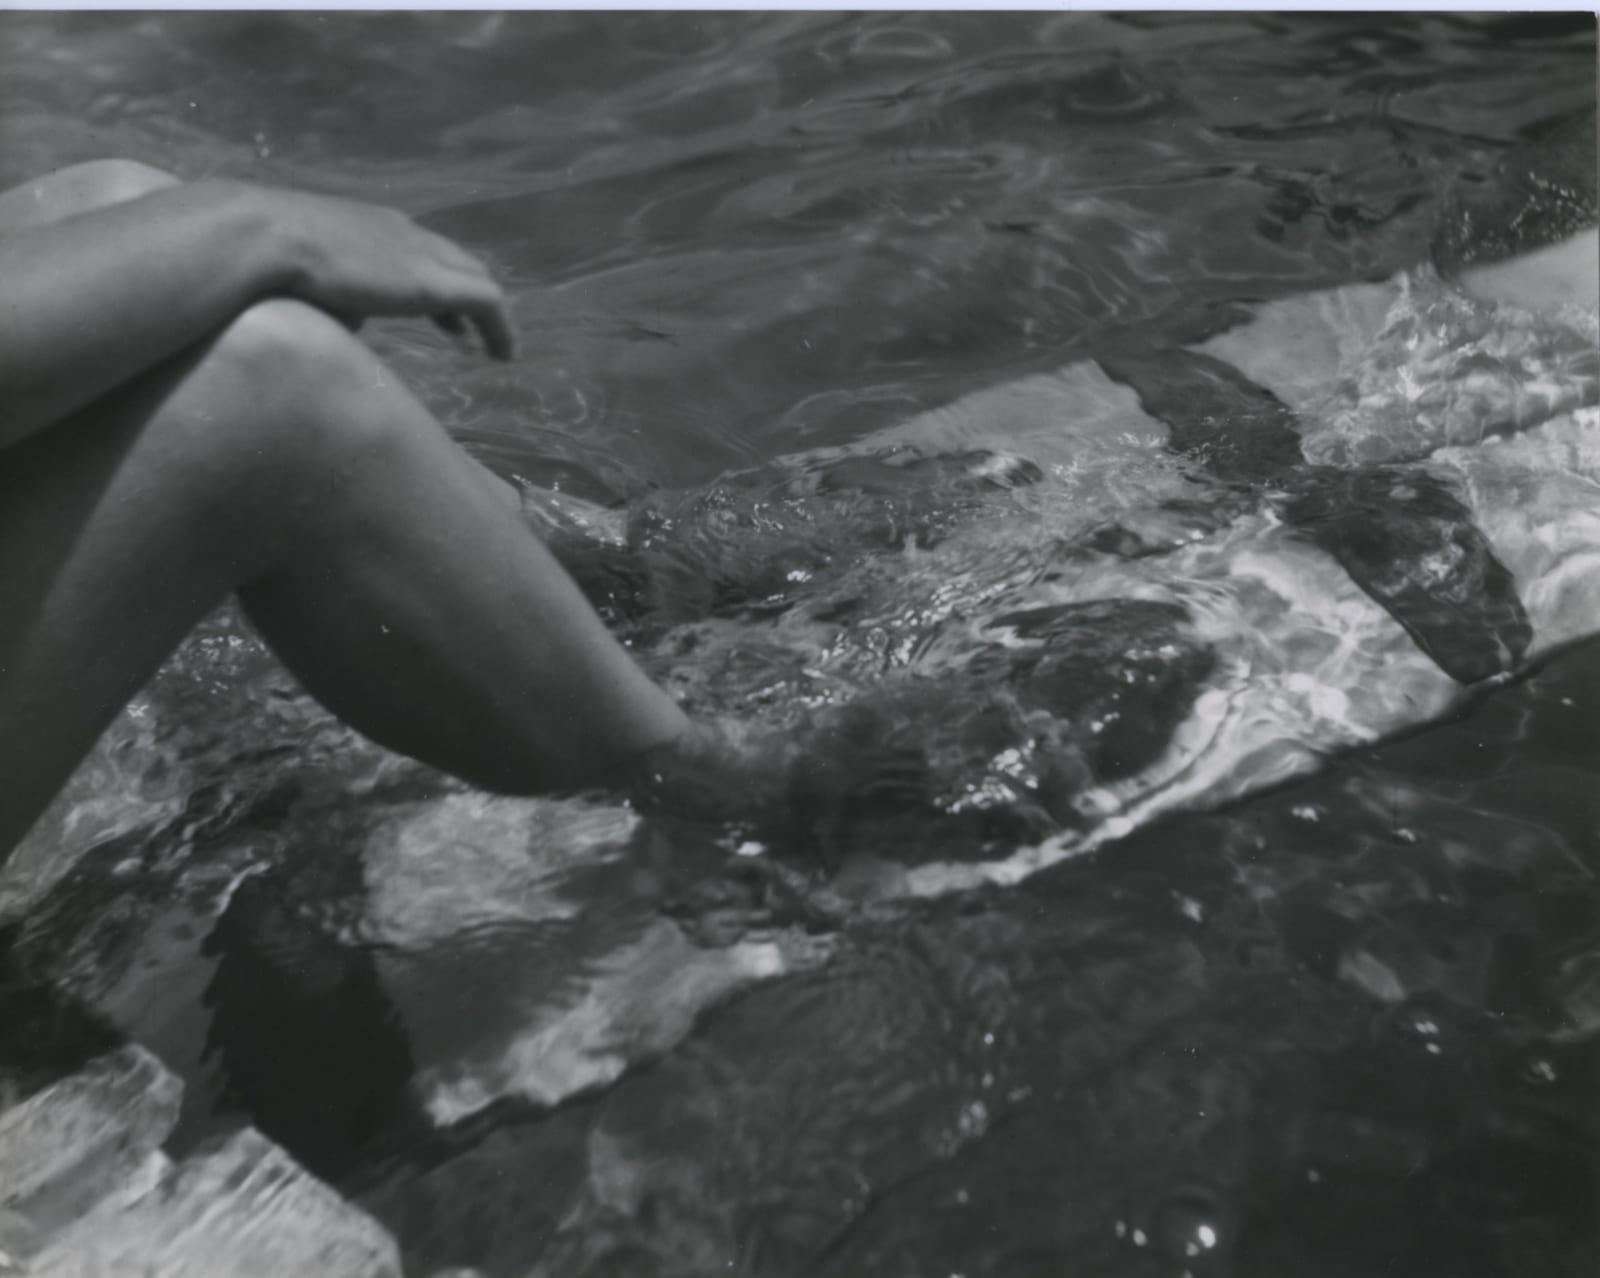 Pierre Boucher, Ski nautique, c. 1933